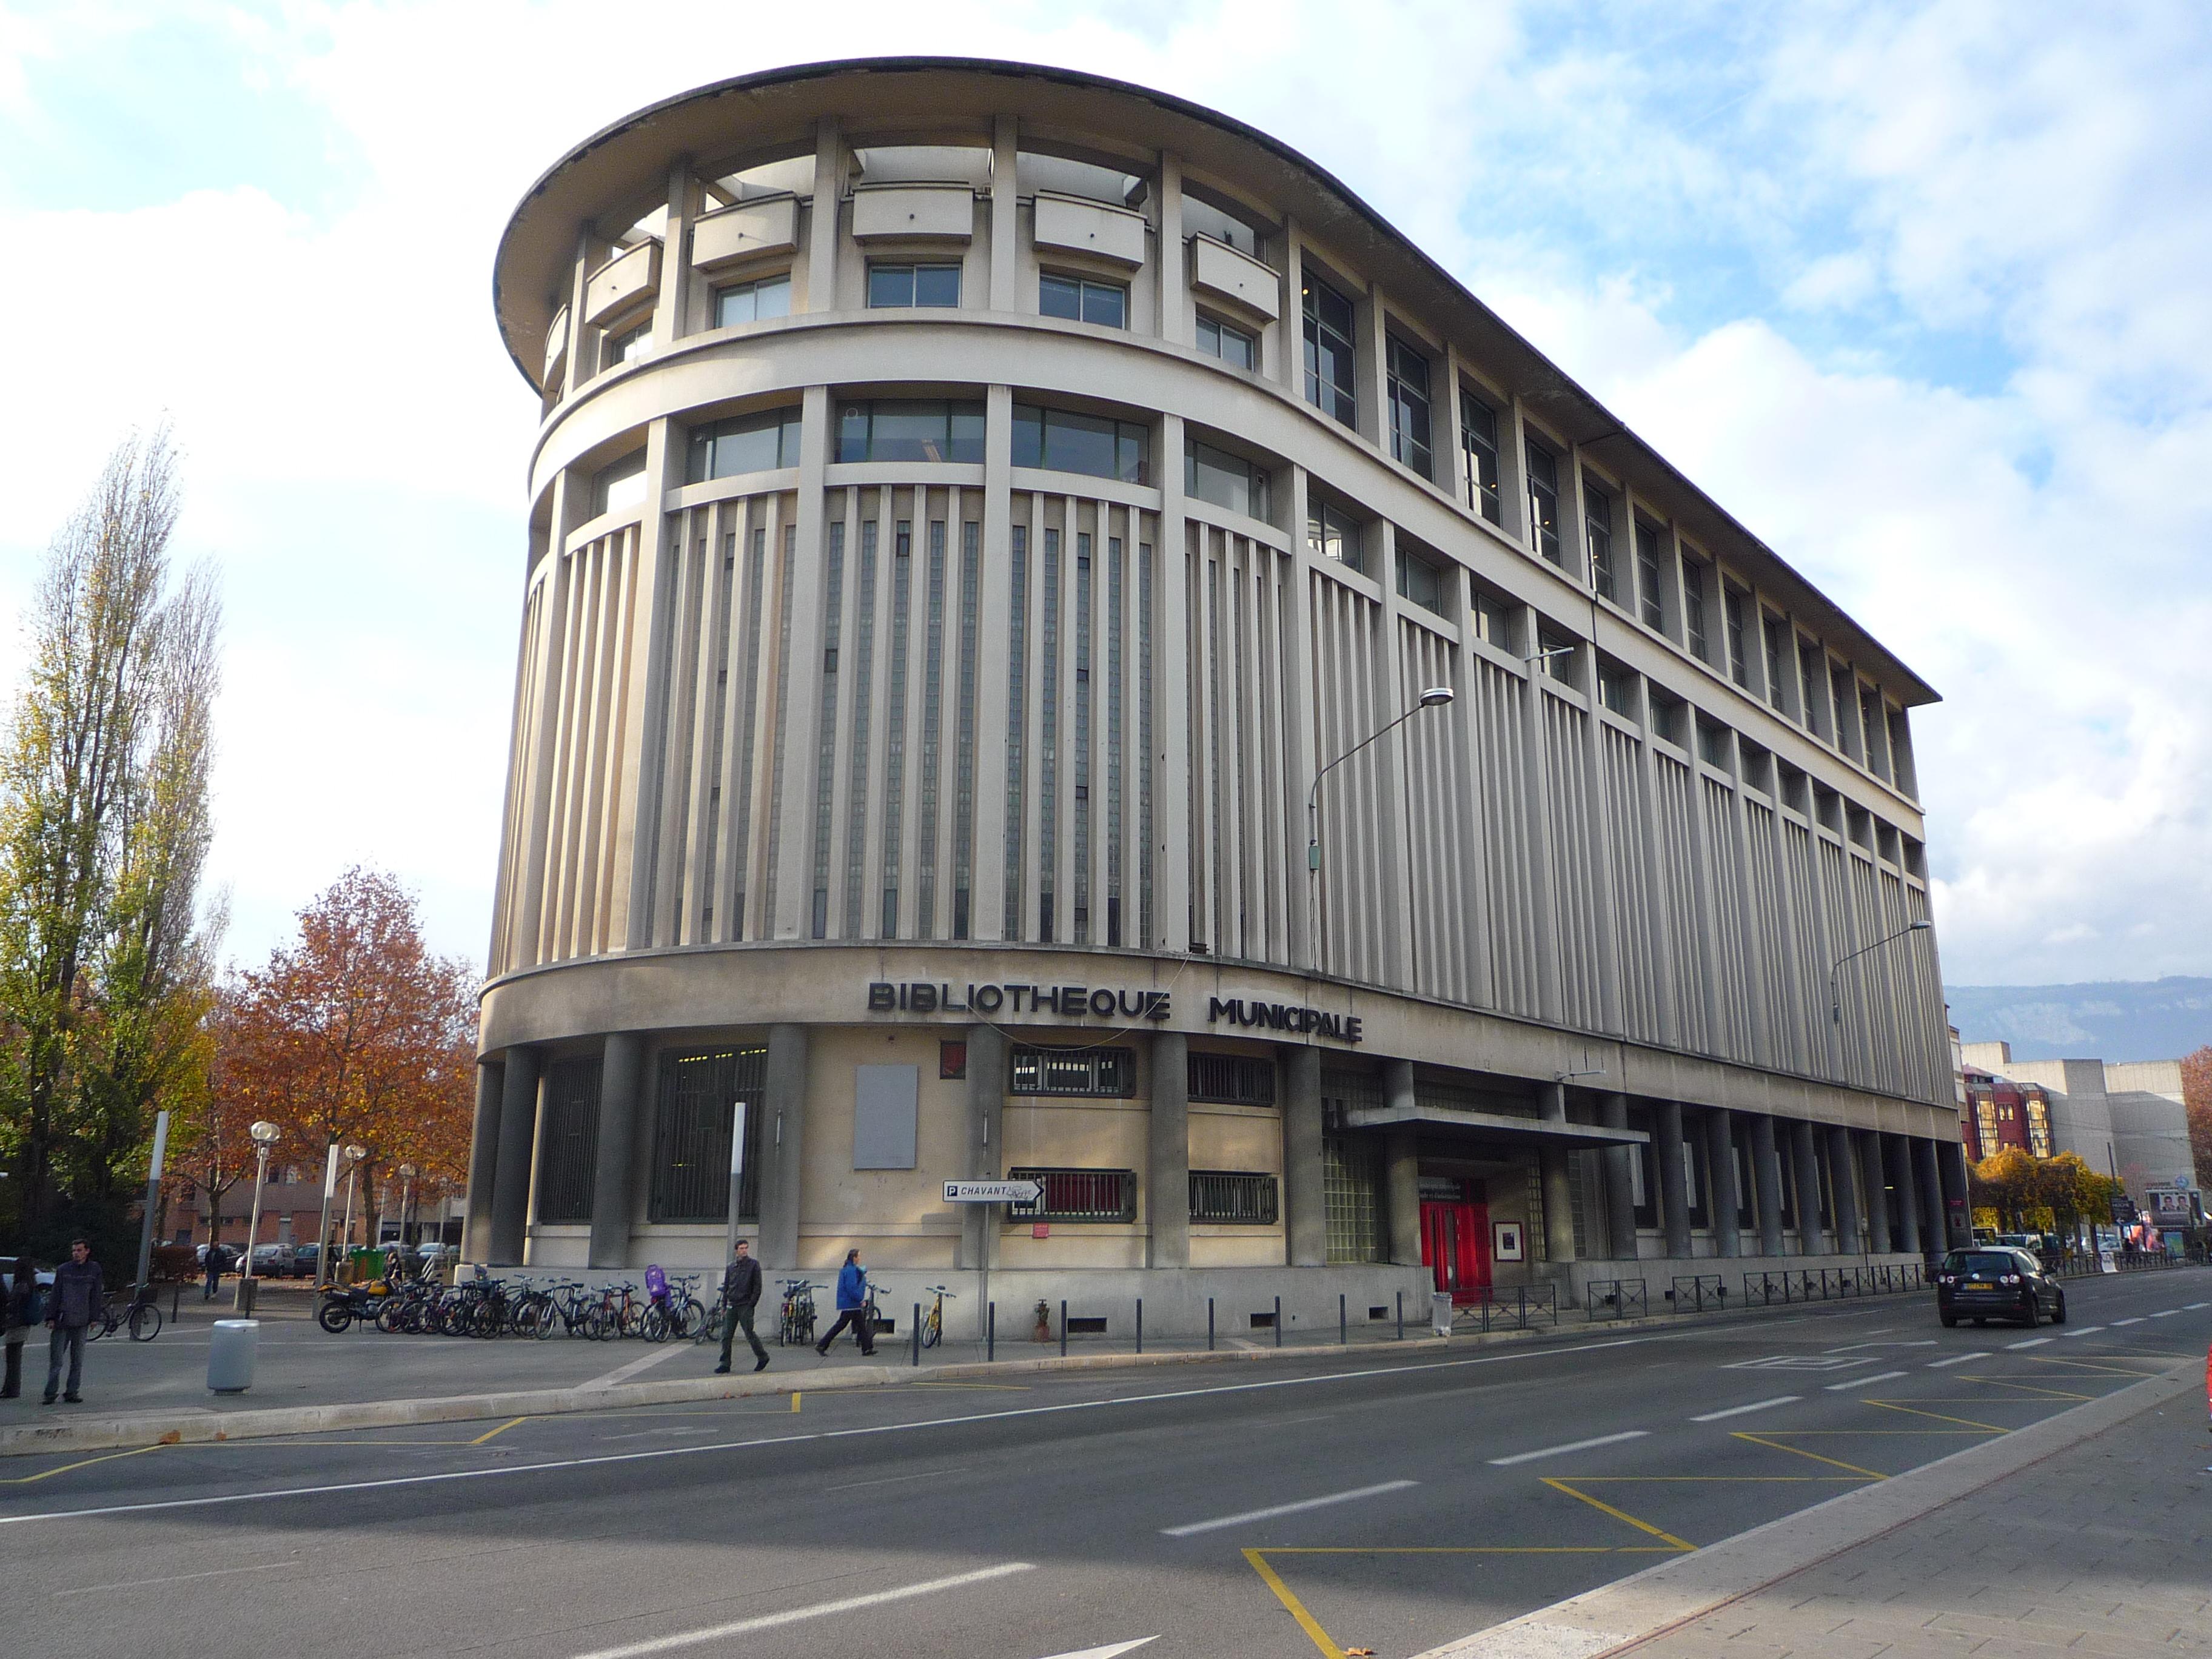 Bibliothèque municipale de grenoble u2014 wikipédia